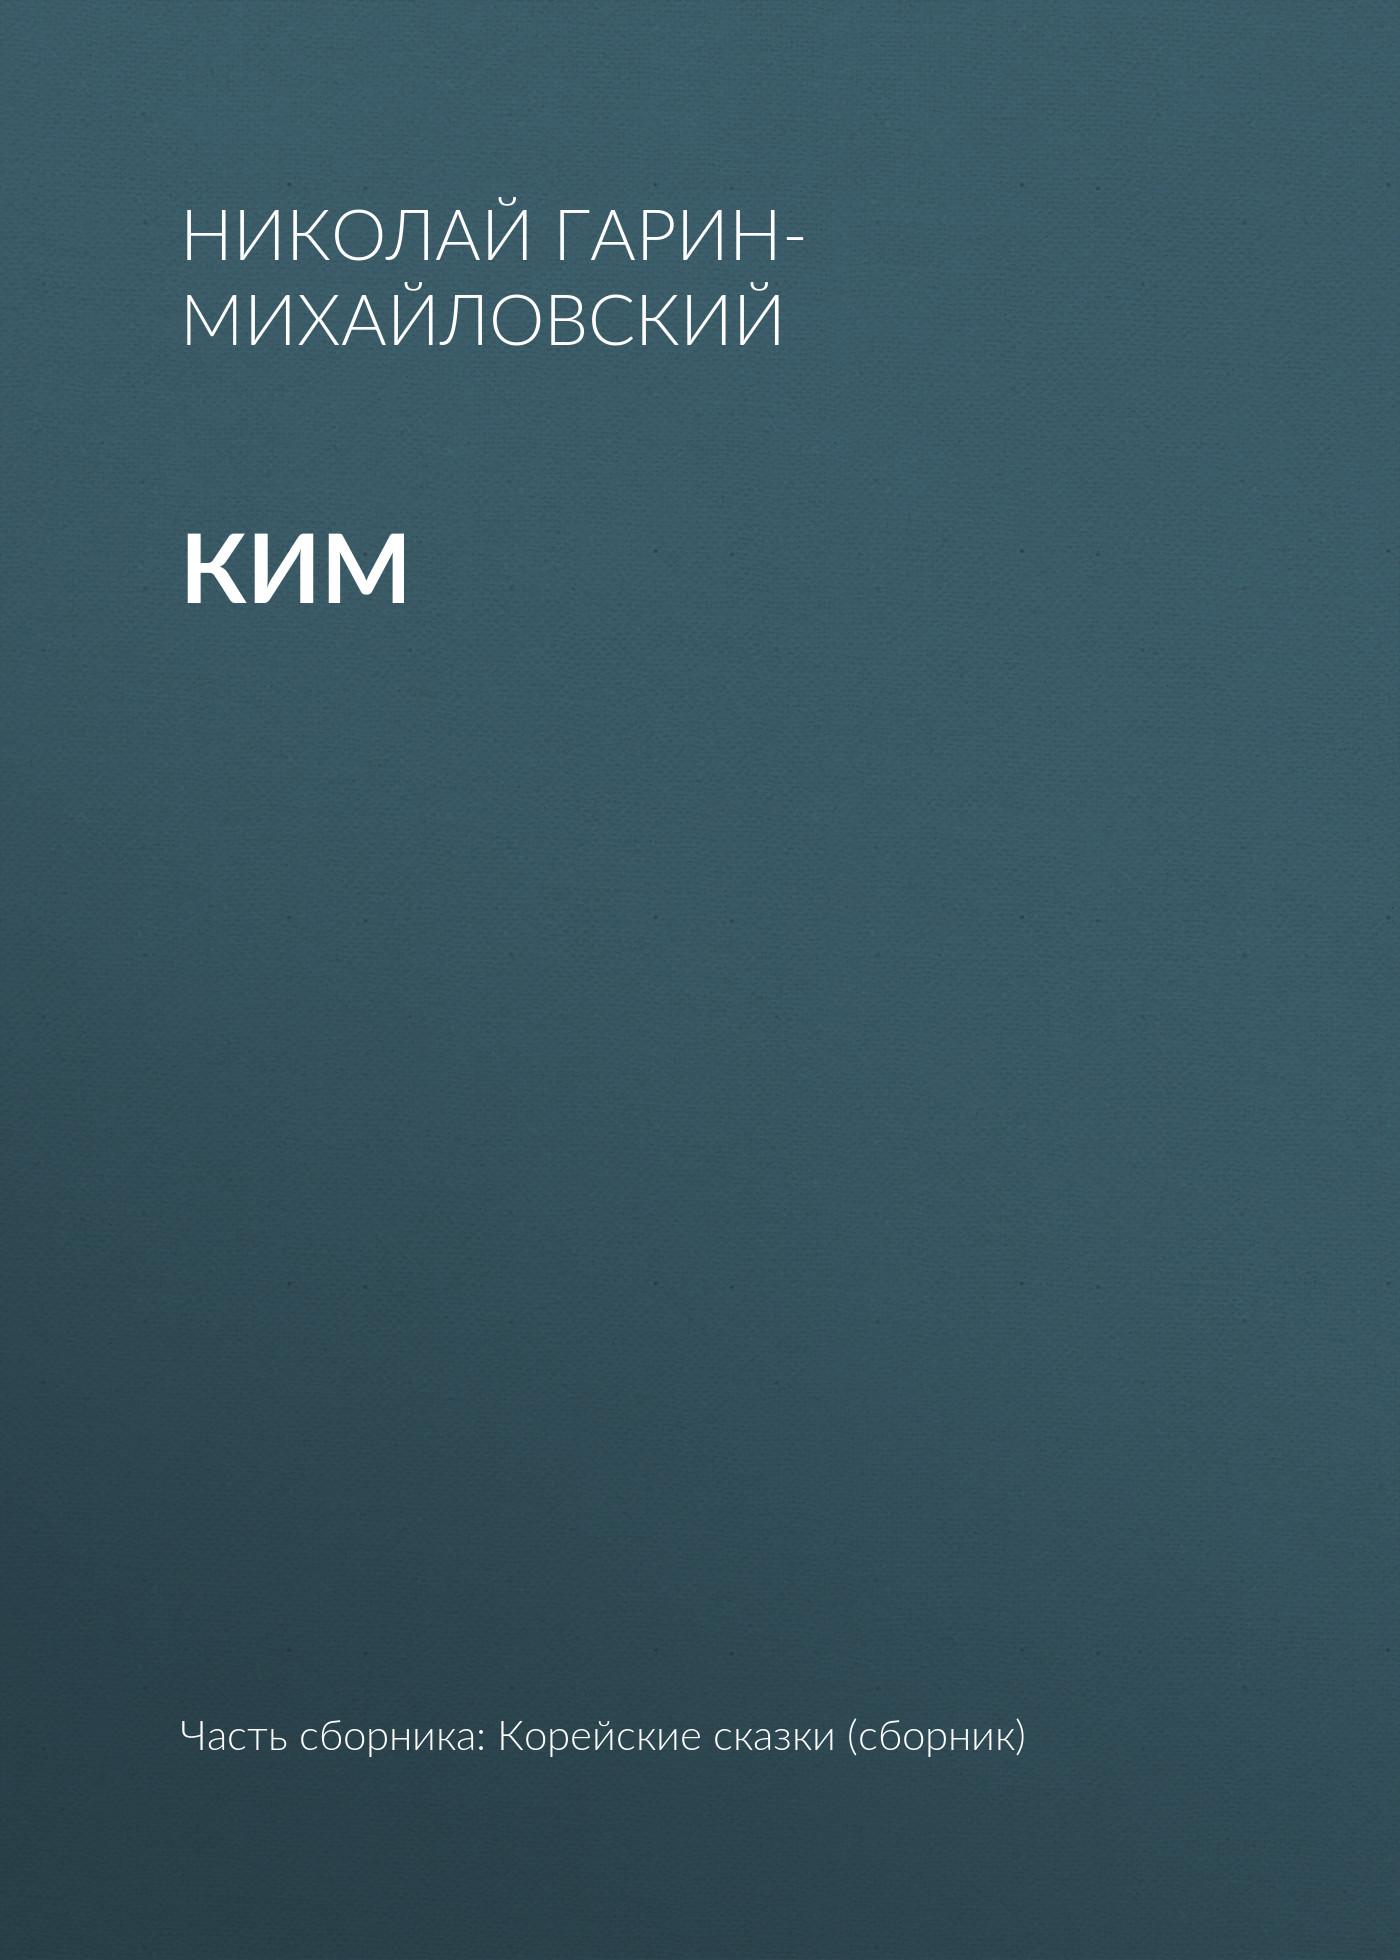 Николай Гарин-Михайловский Ким николай гарин михайловский счастье